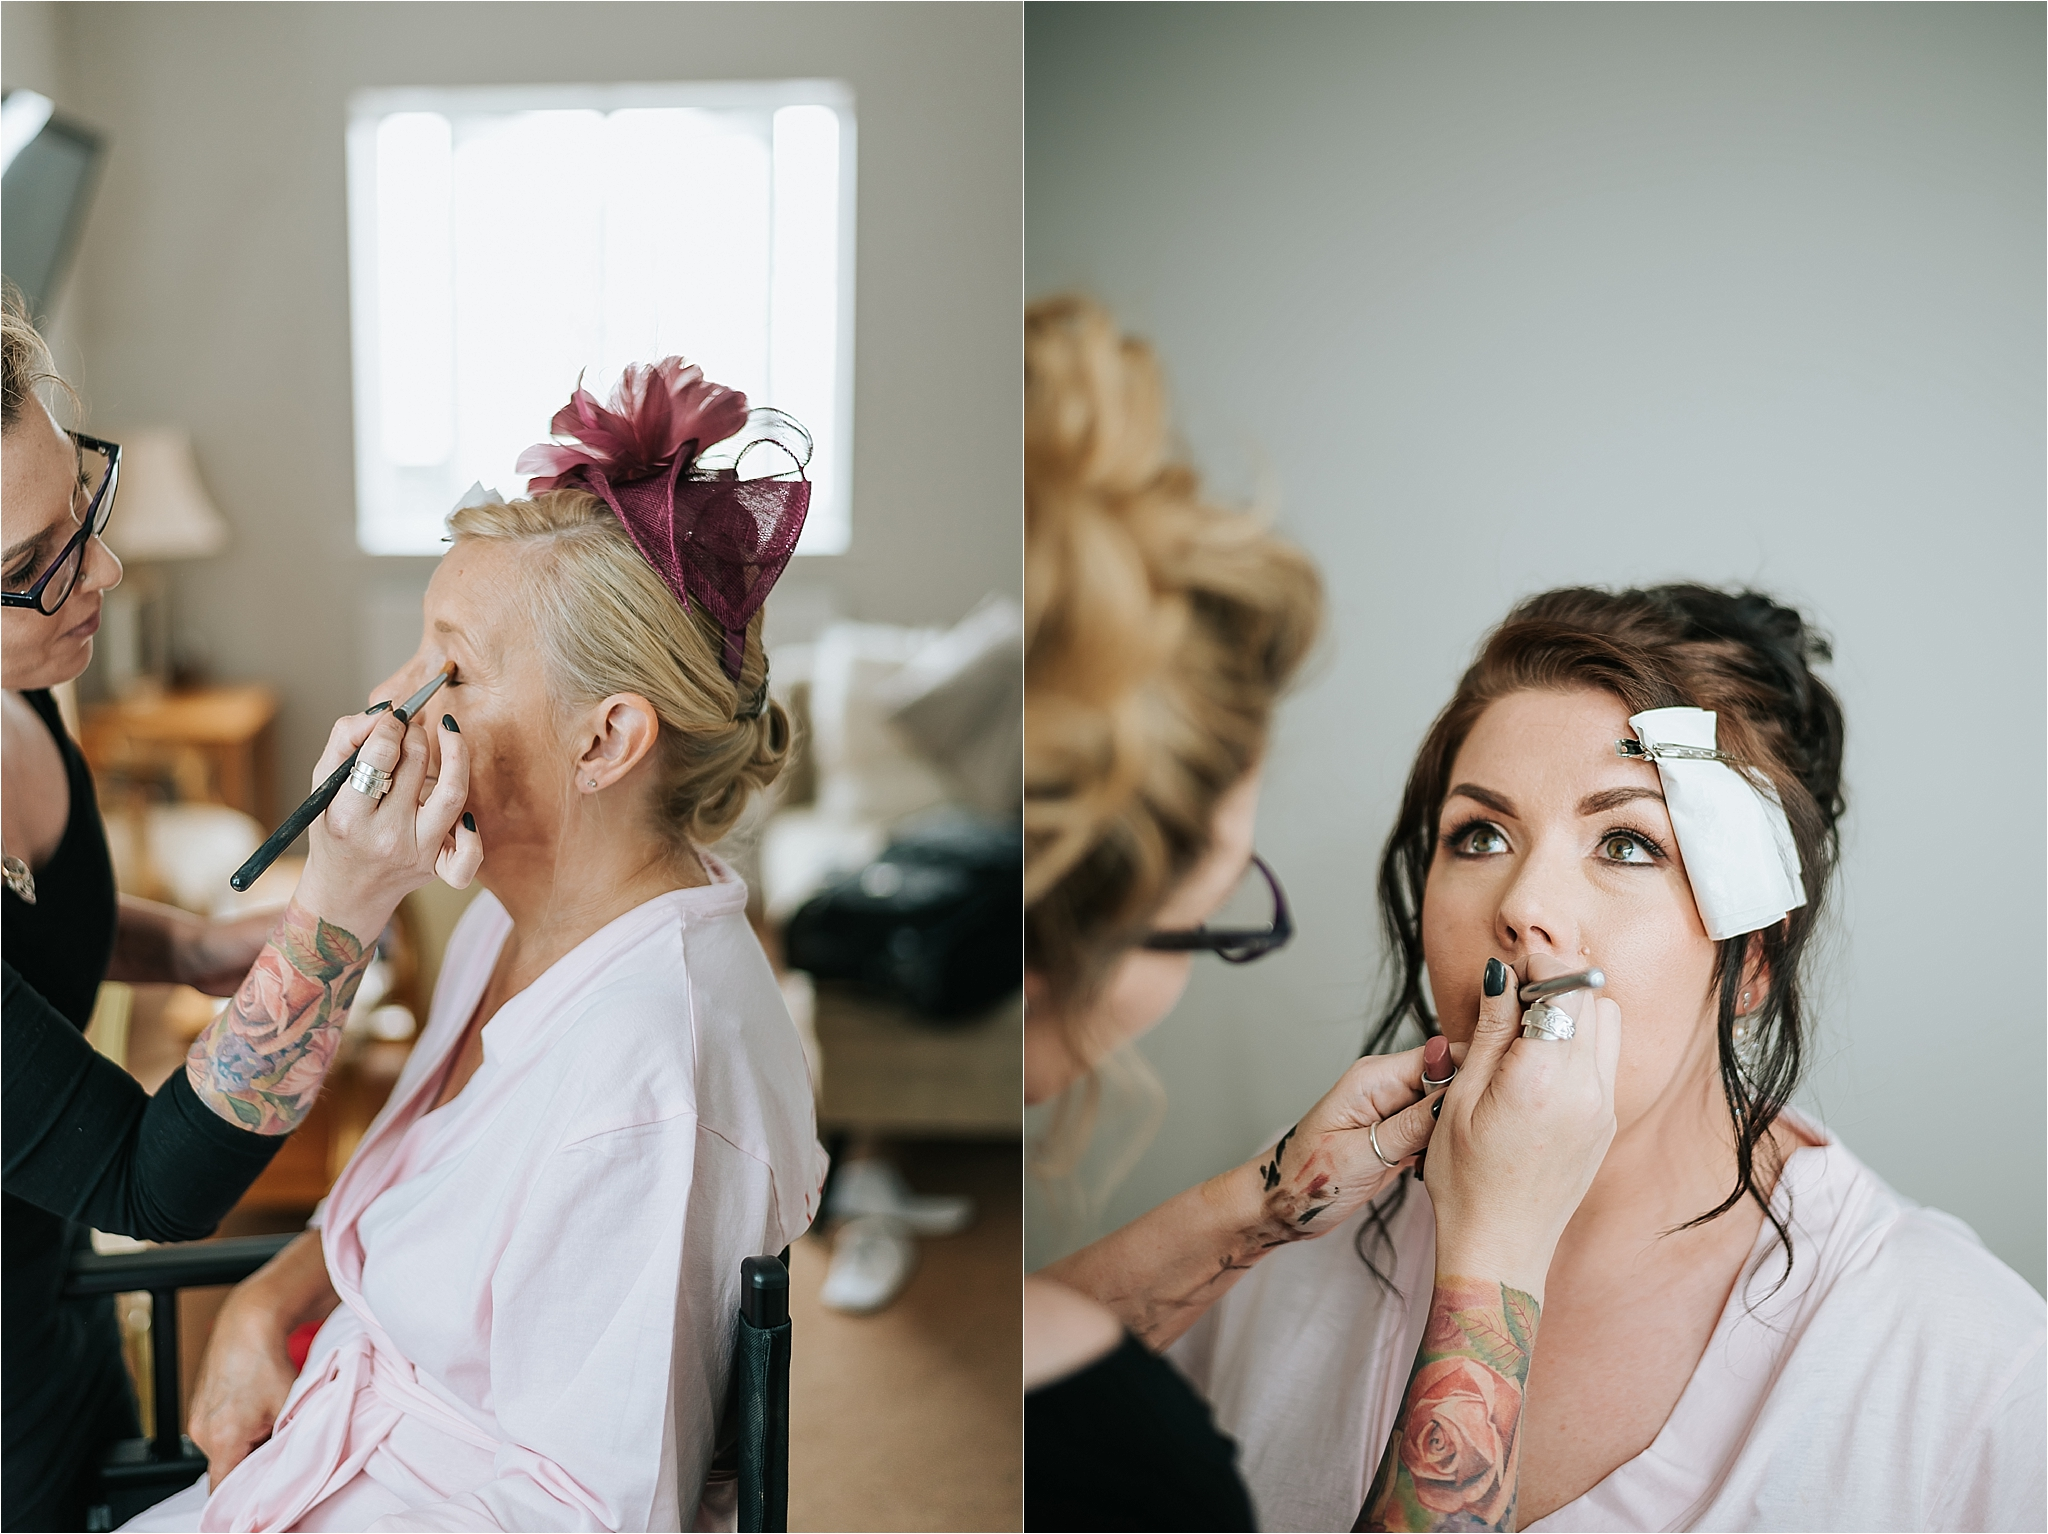 thevilla+lancashire+wreagreen+wedding+photographer1.jpg